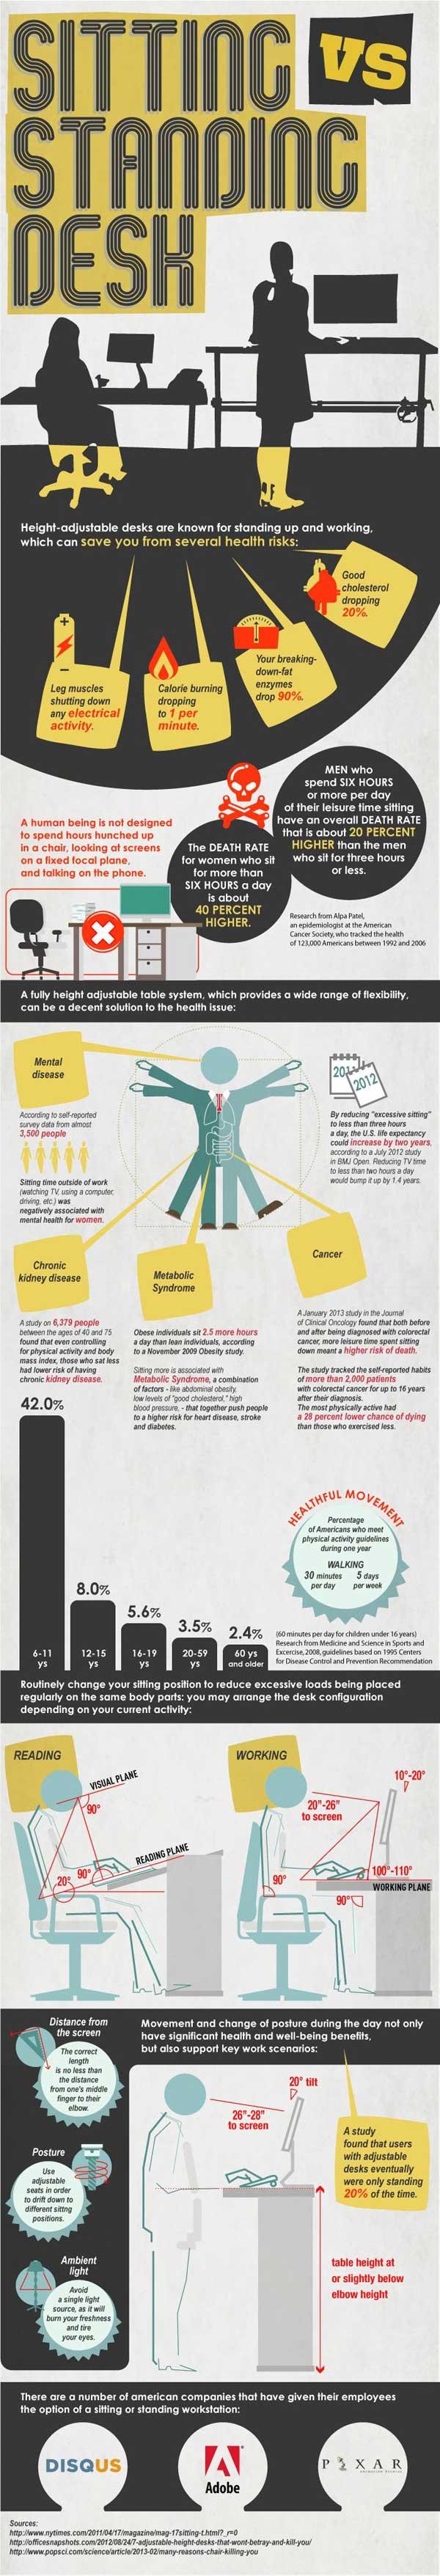 Infographic showing Standing Desk vs. Sitting Desk comparison